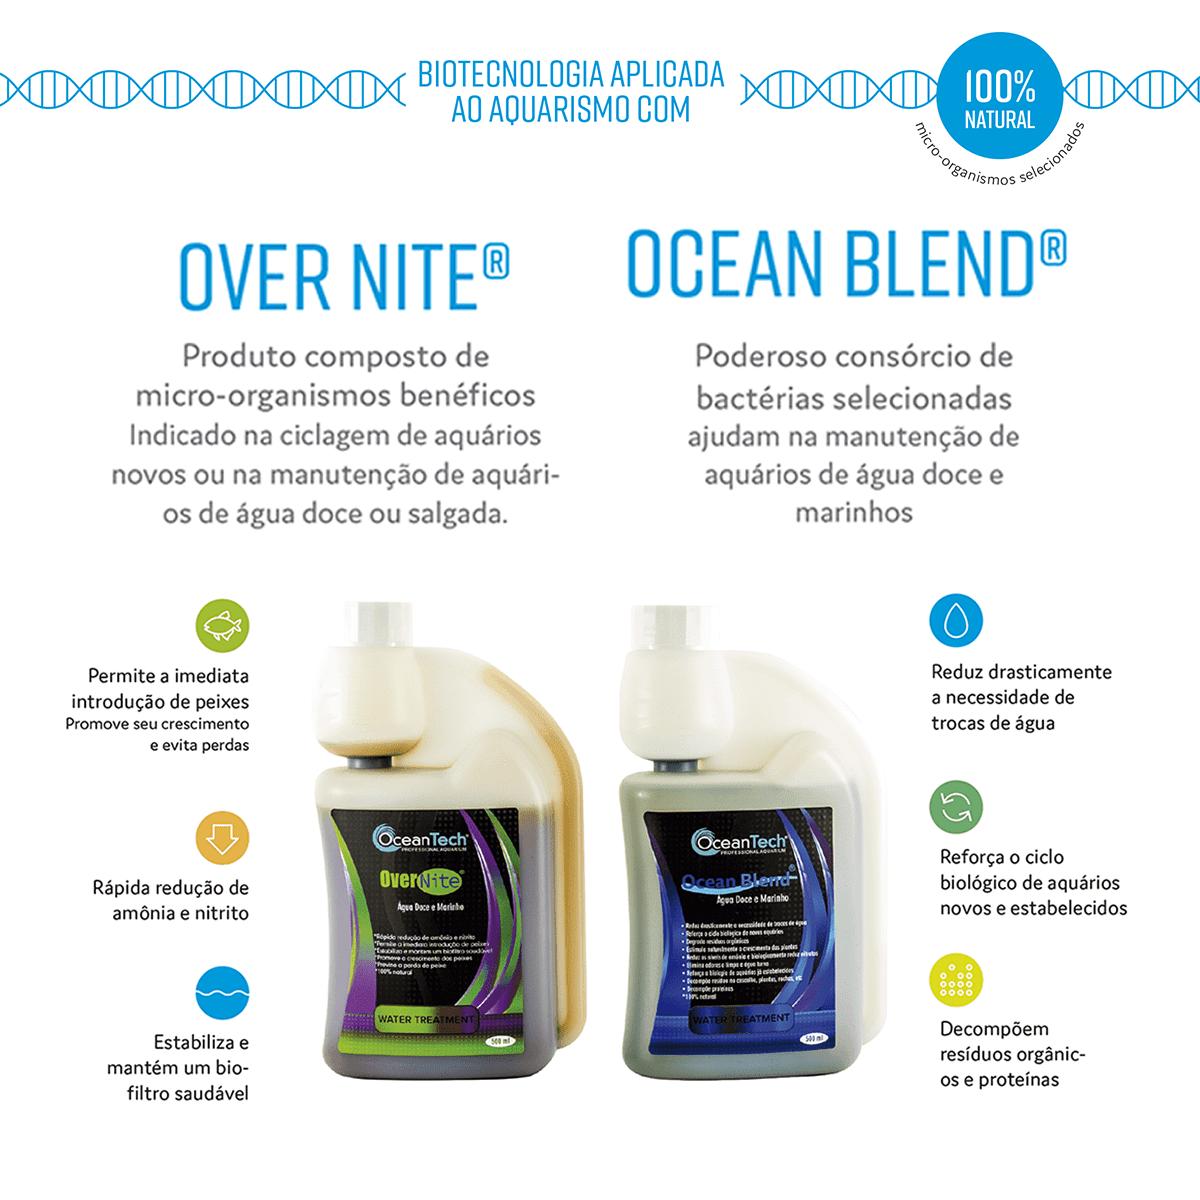 Kit Biológico Ocean Tech Ocean Blend + Over Nite - 120ml